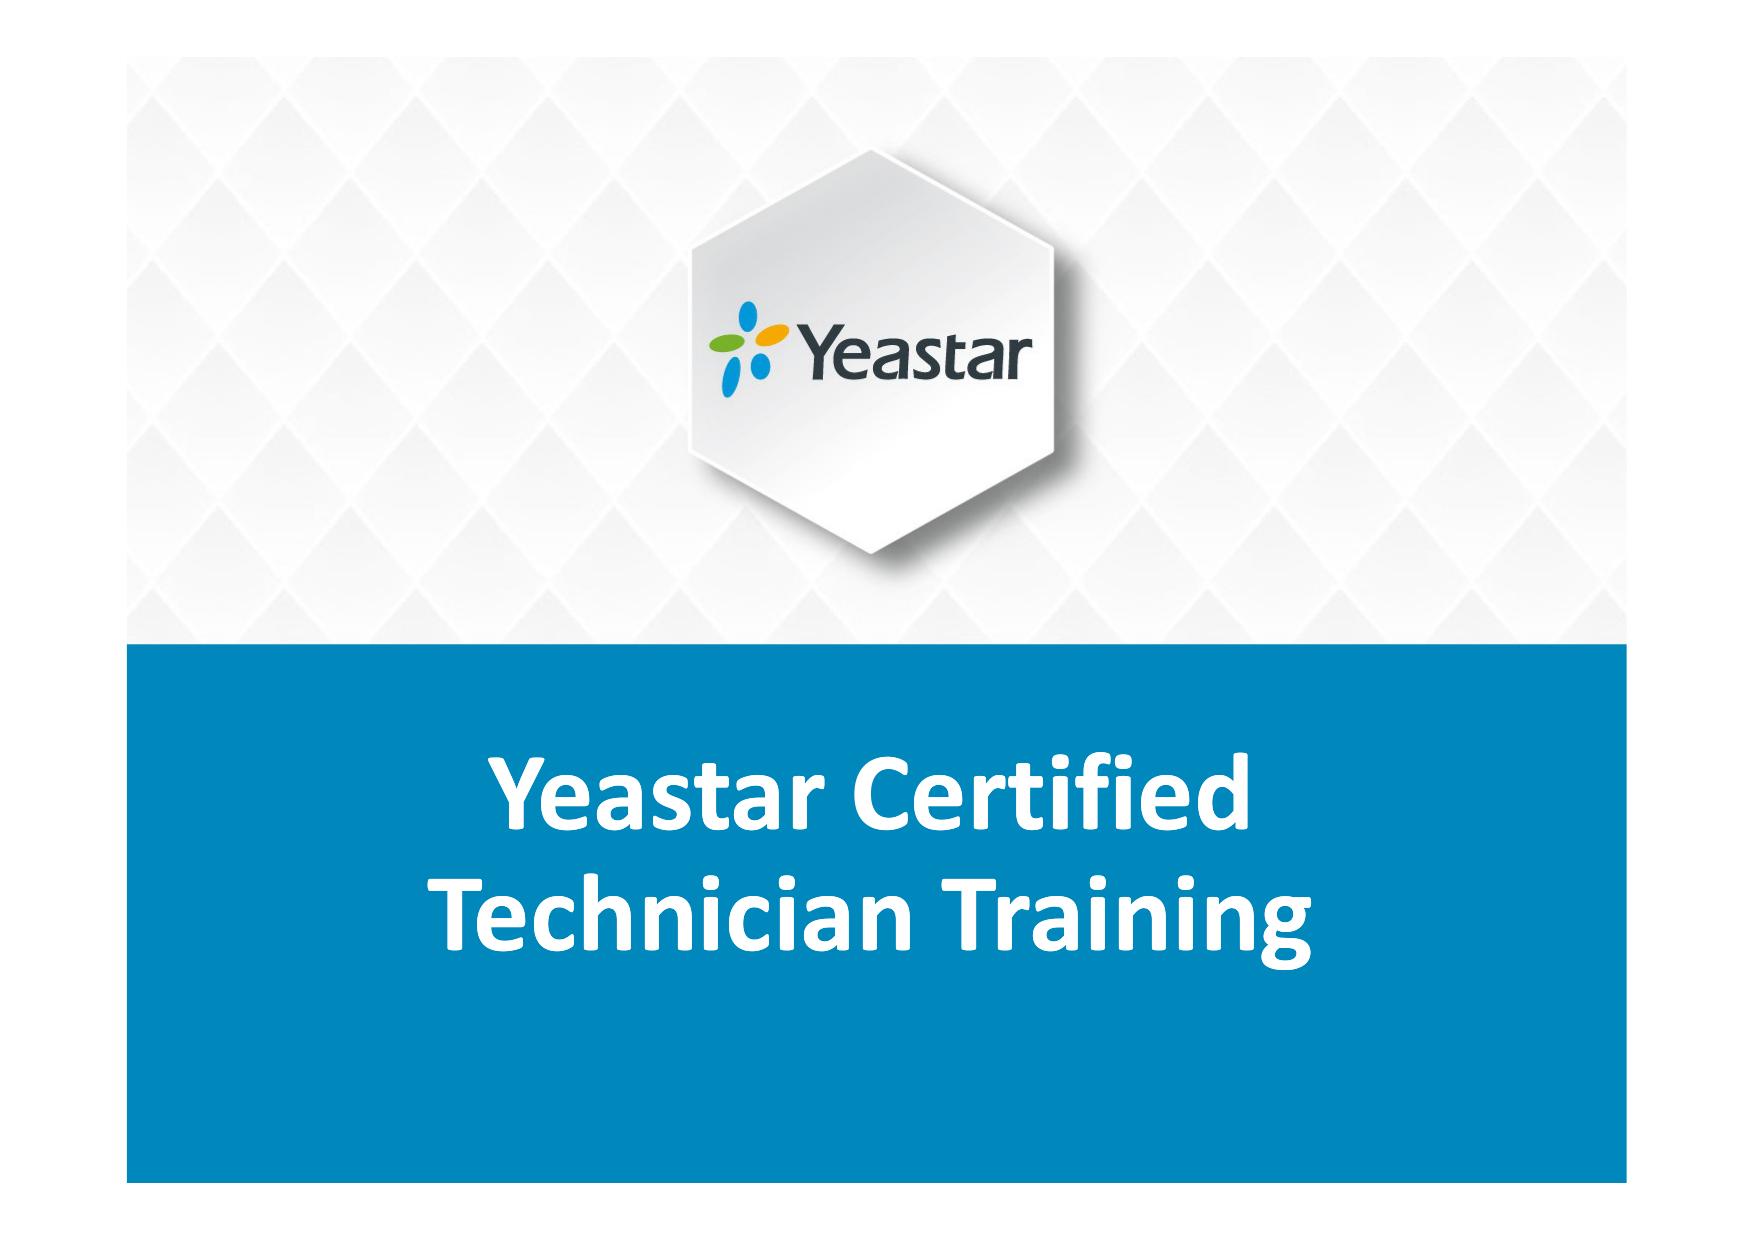 Yeastar Certified Technician Training   manualzz com